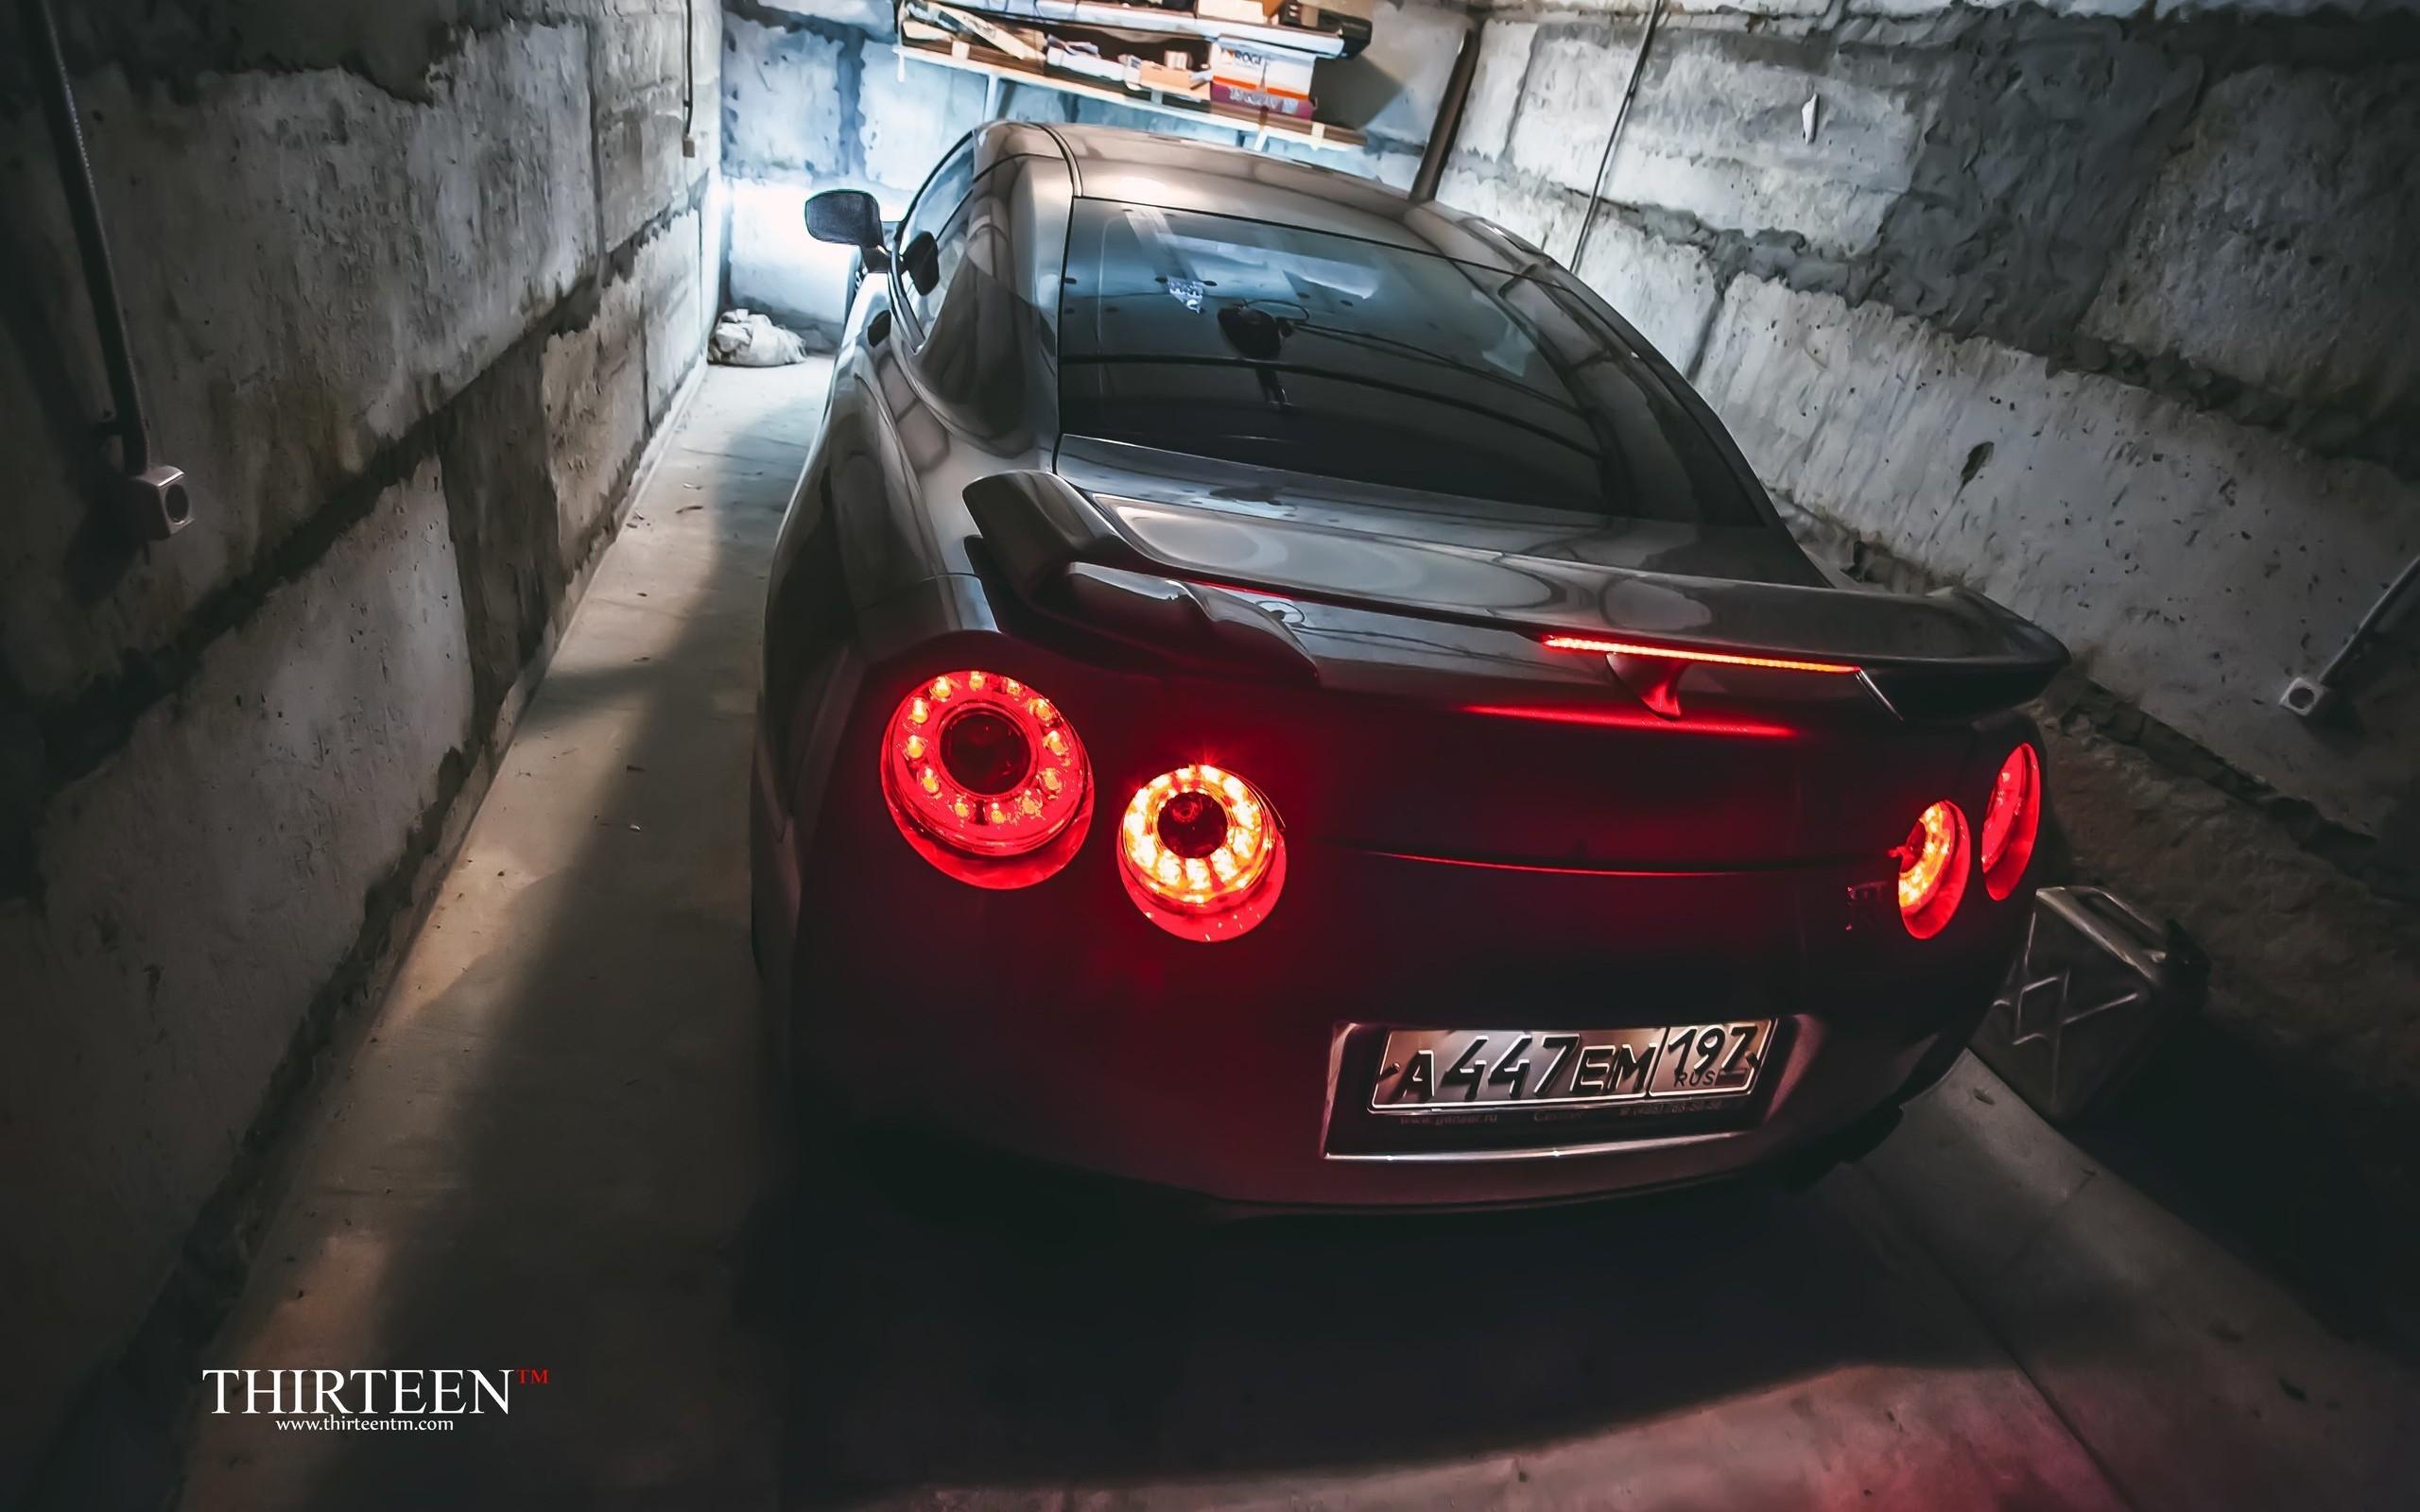 Wallpaper : Technology, Sports Car, Nissan GT R, Coupe, Performance Car,  Light, Rim, Supercar, 2560x1600 Px, Nissan Skyline GT, R R35, Computer  Wallpaper, ...